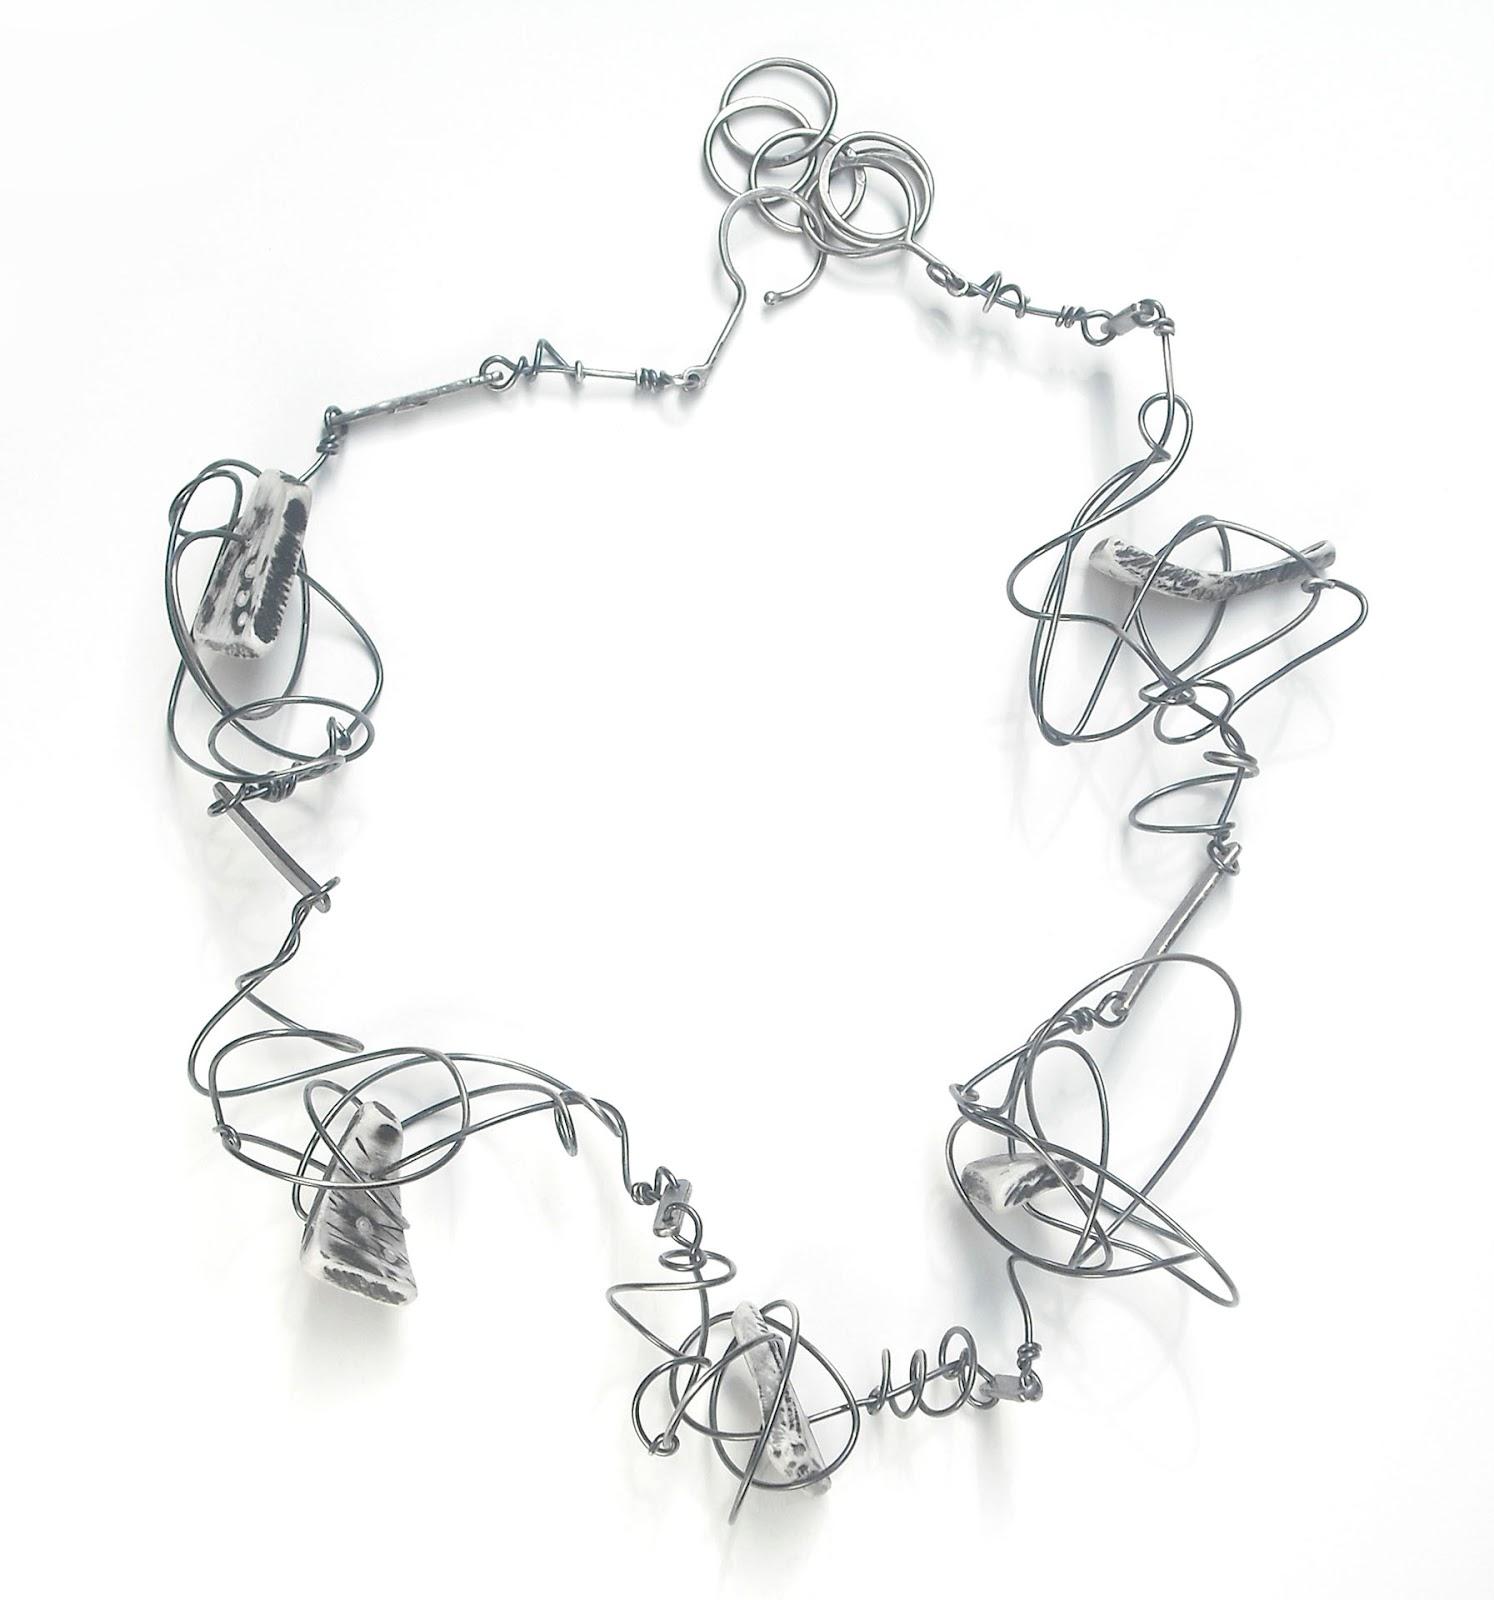 Casey Sheppard Designs: Fall Jewelry Sale